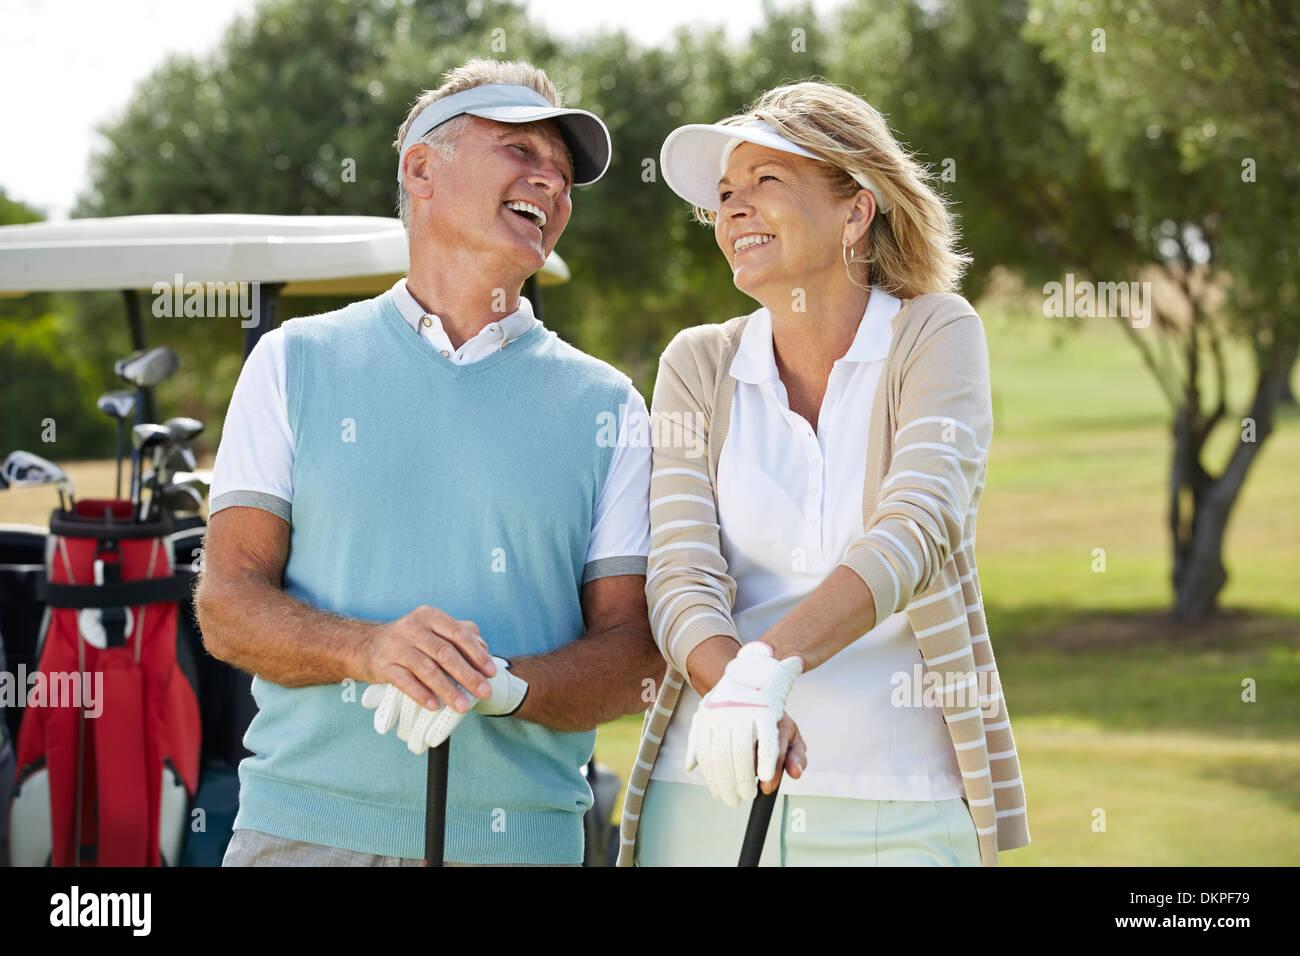 Couple on golf course Photo Stock